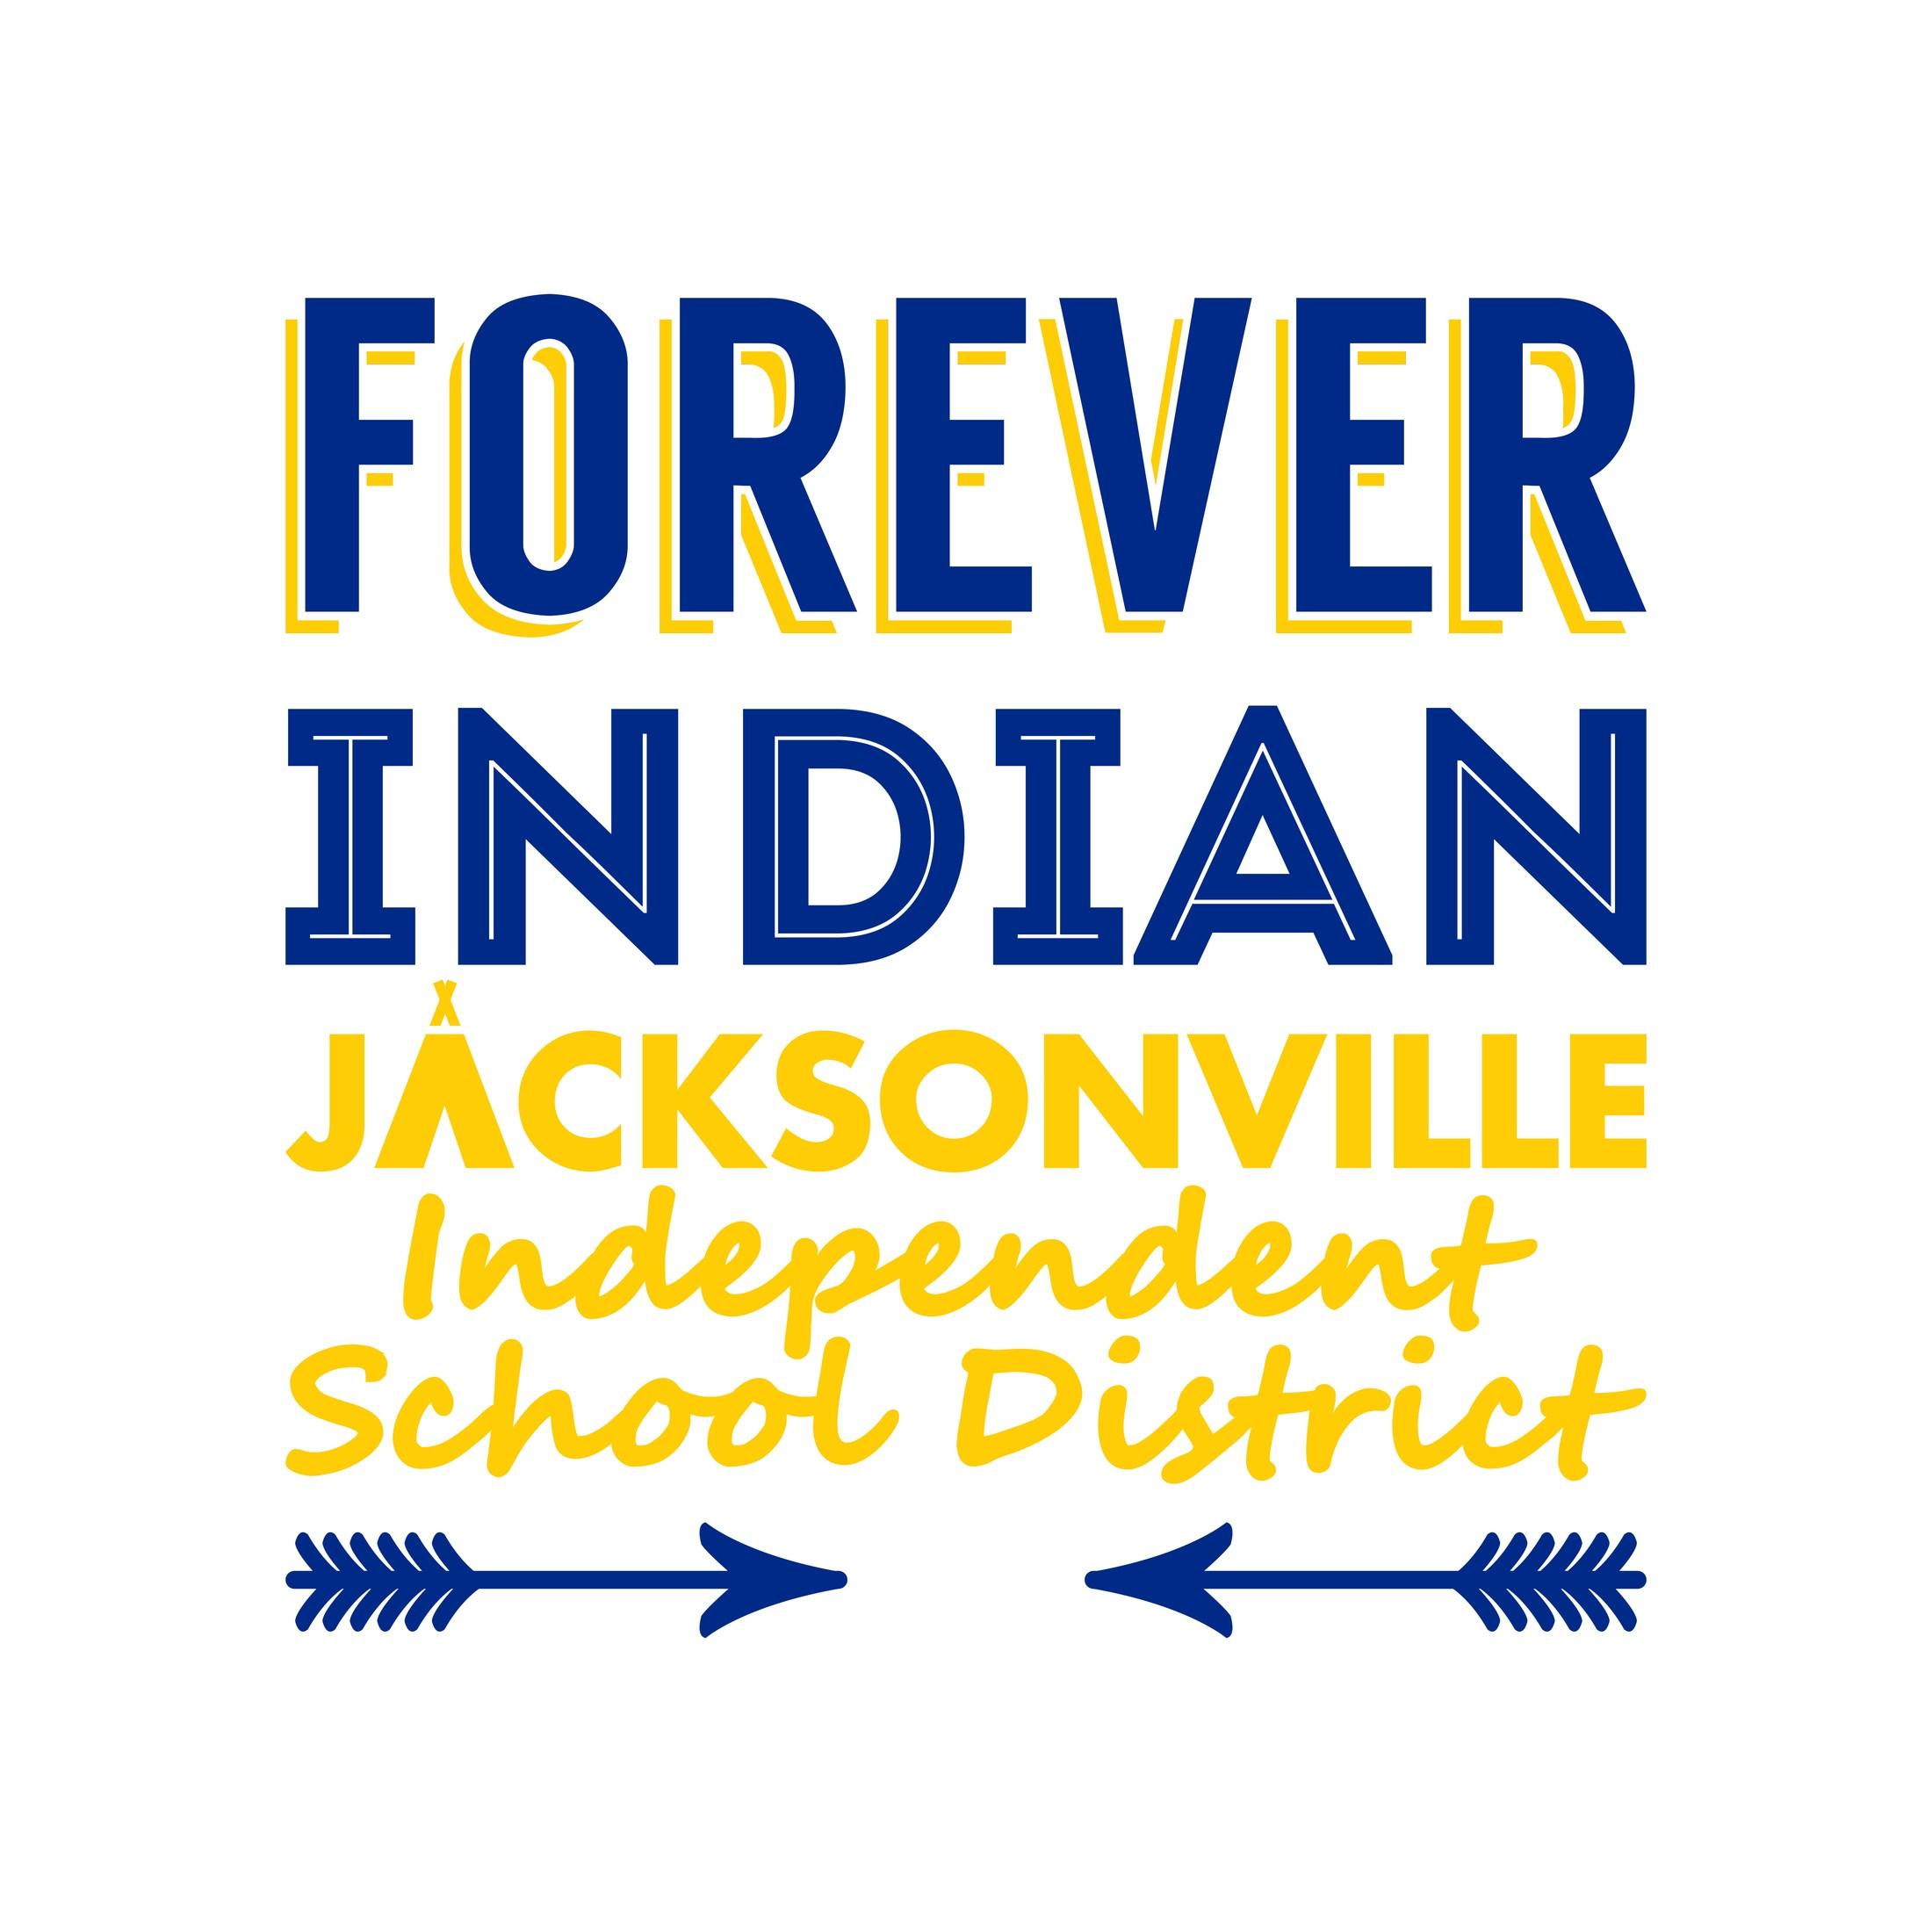 Forever Indian logo